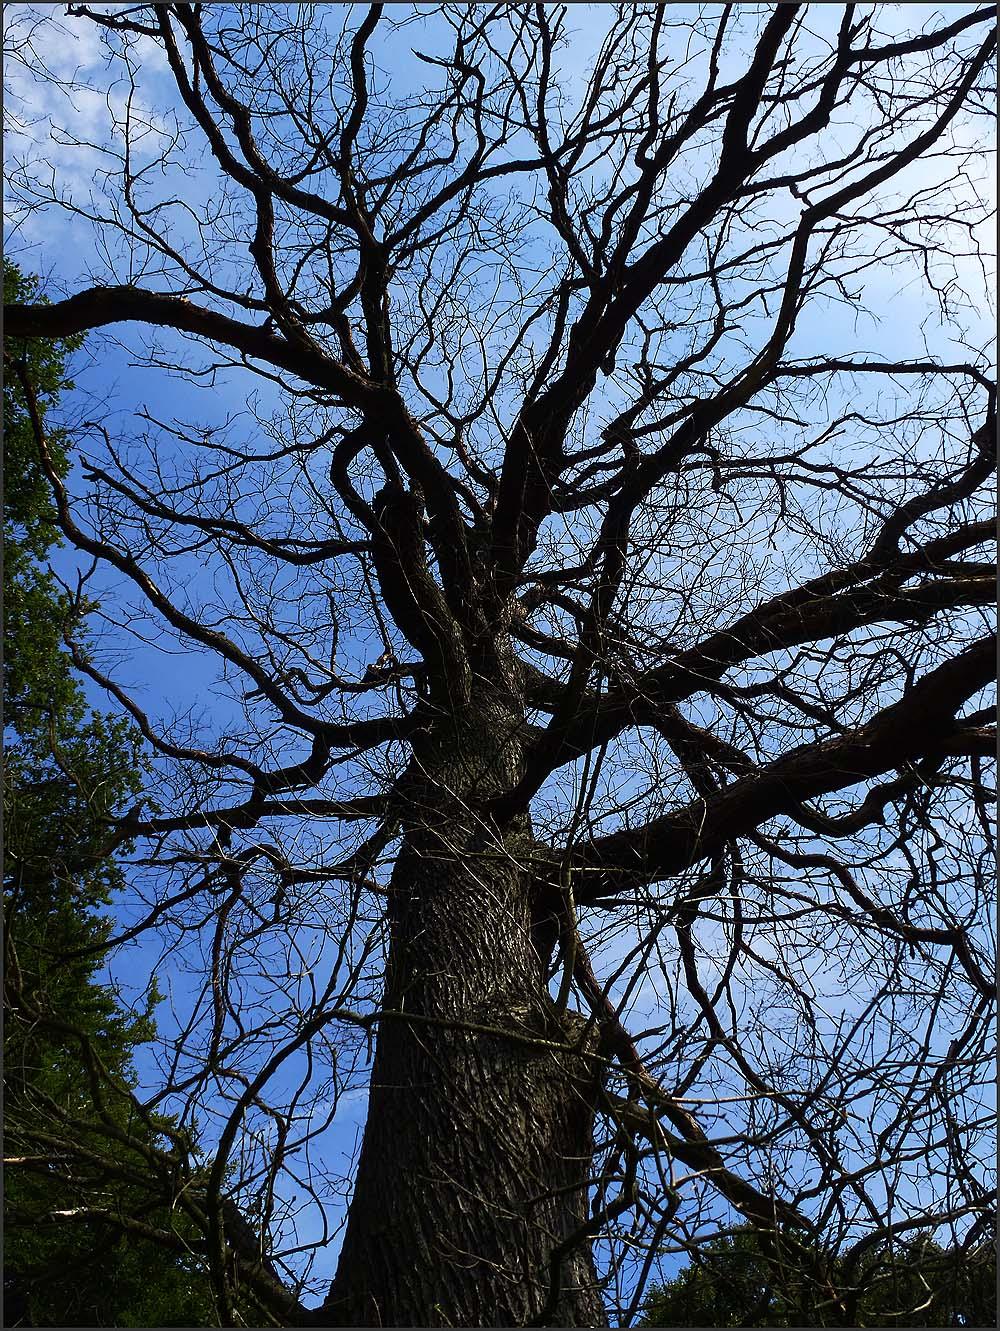 Senkrecht hinauf geguckt in den kahlen Baum - Felderbachtal in der Elfringhauser Schweiz